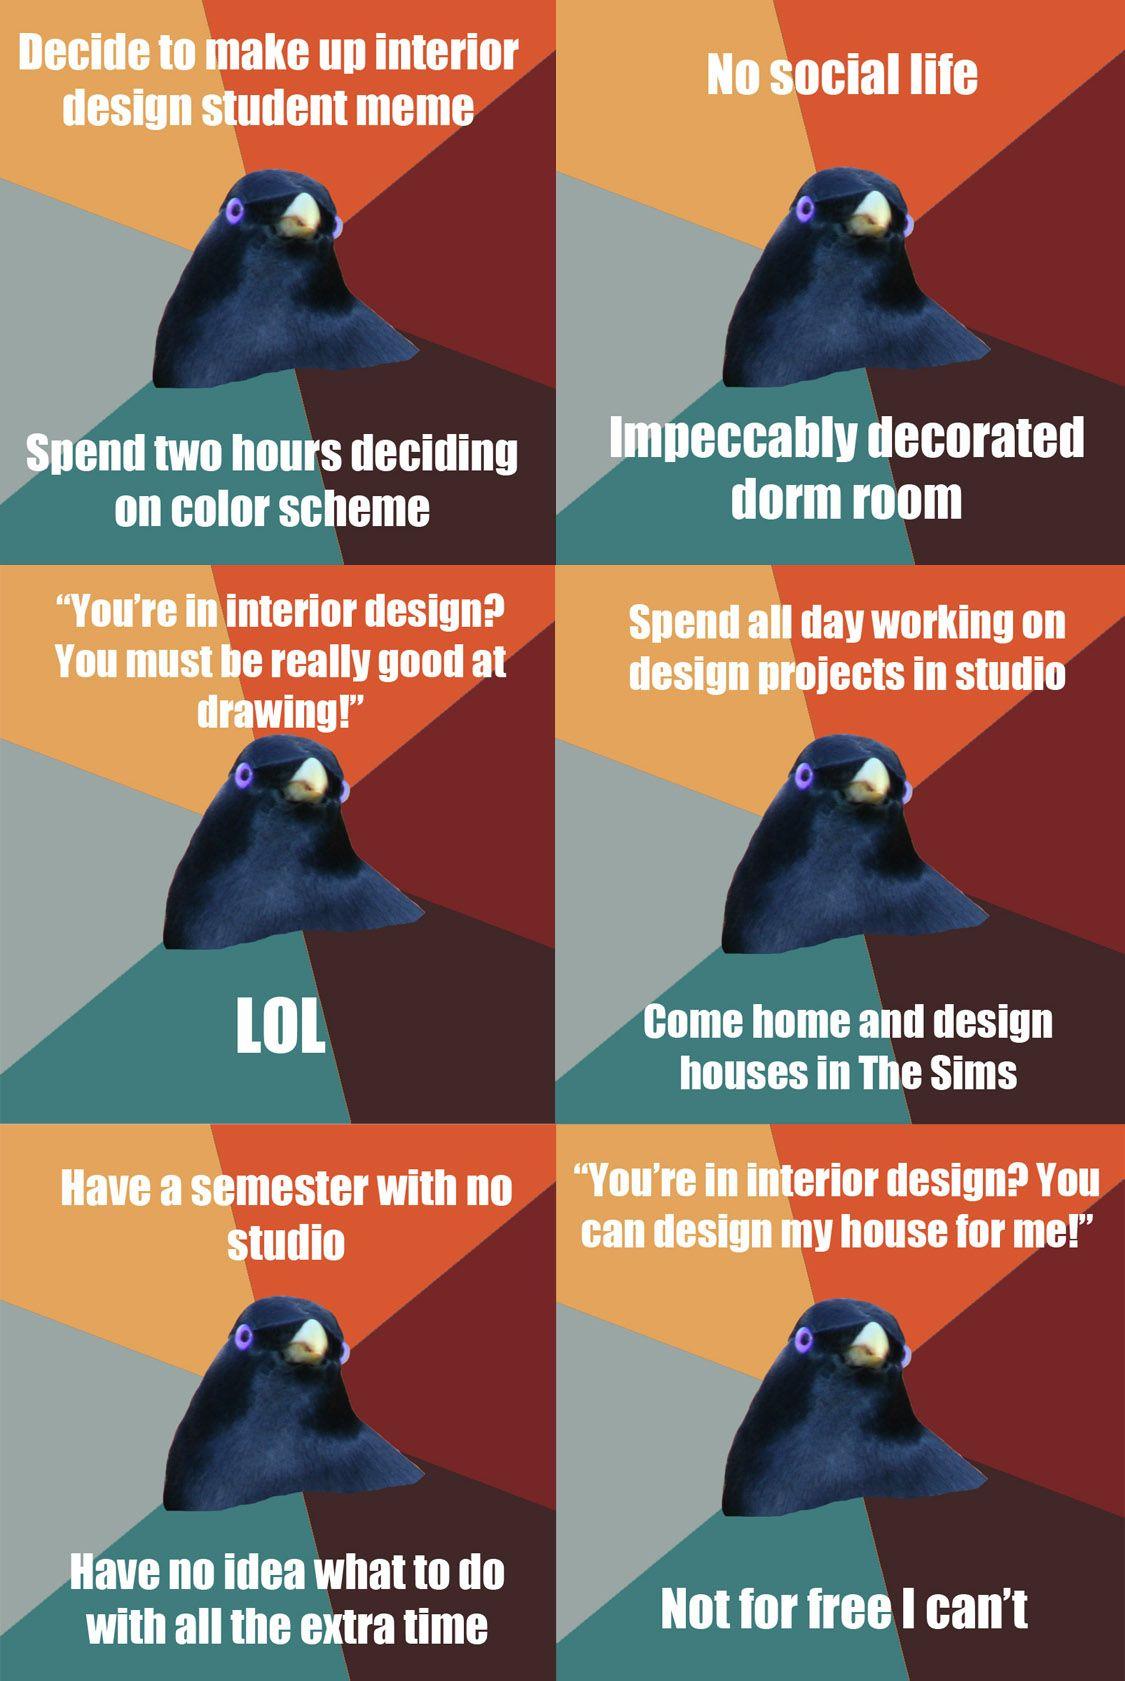 Interior Design Student Memes At Catybug96 Student Memes